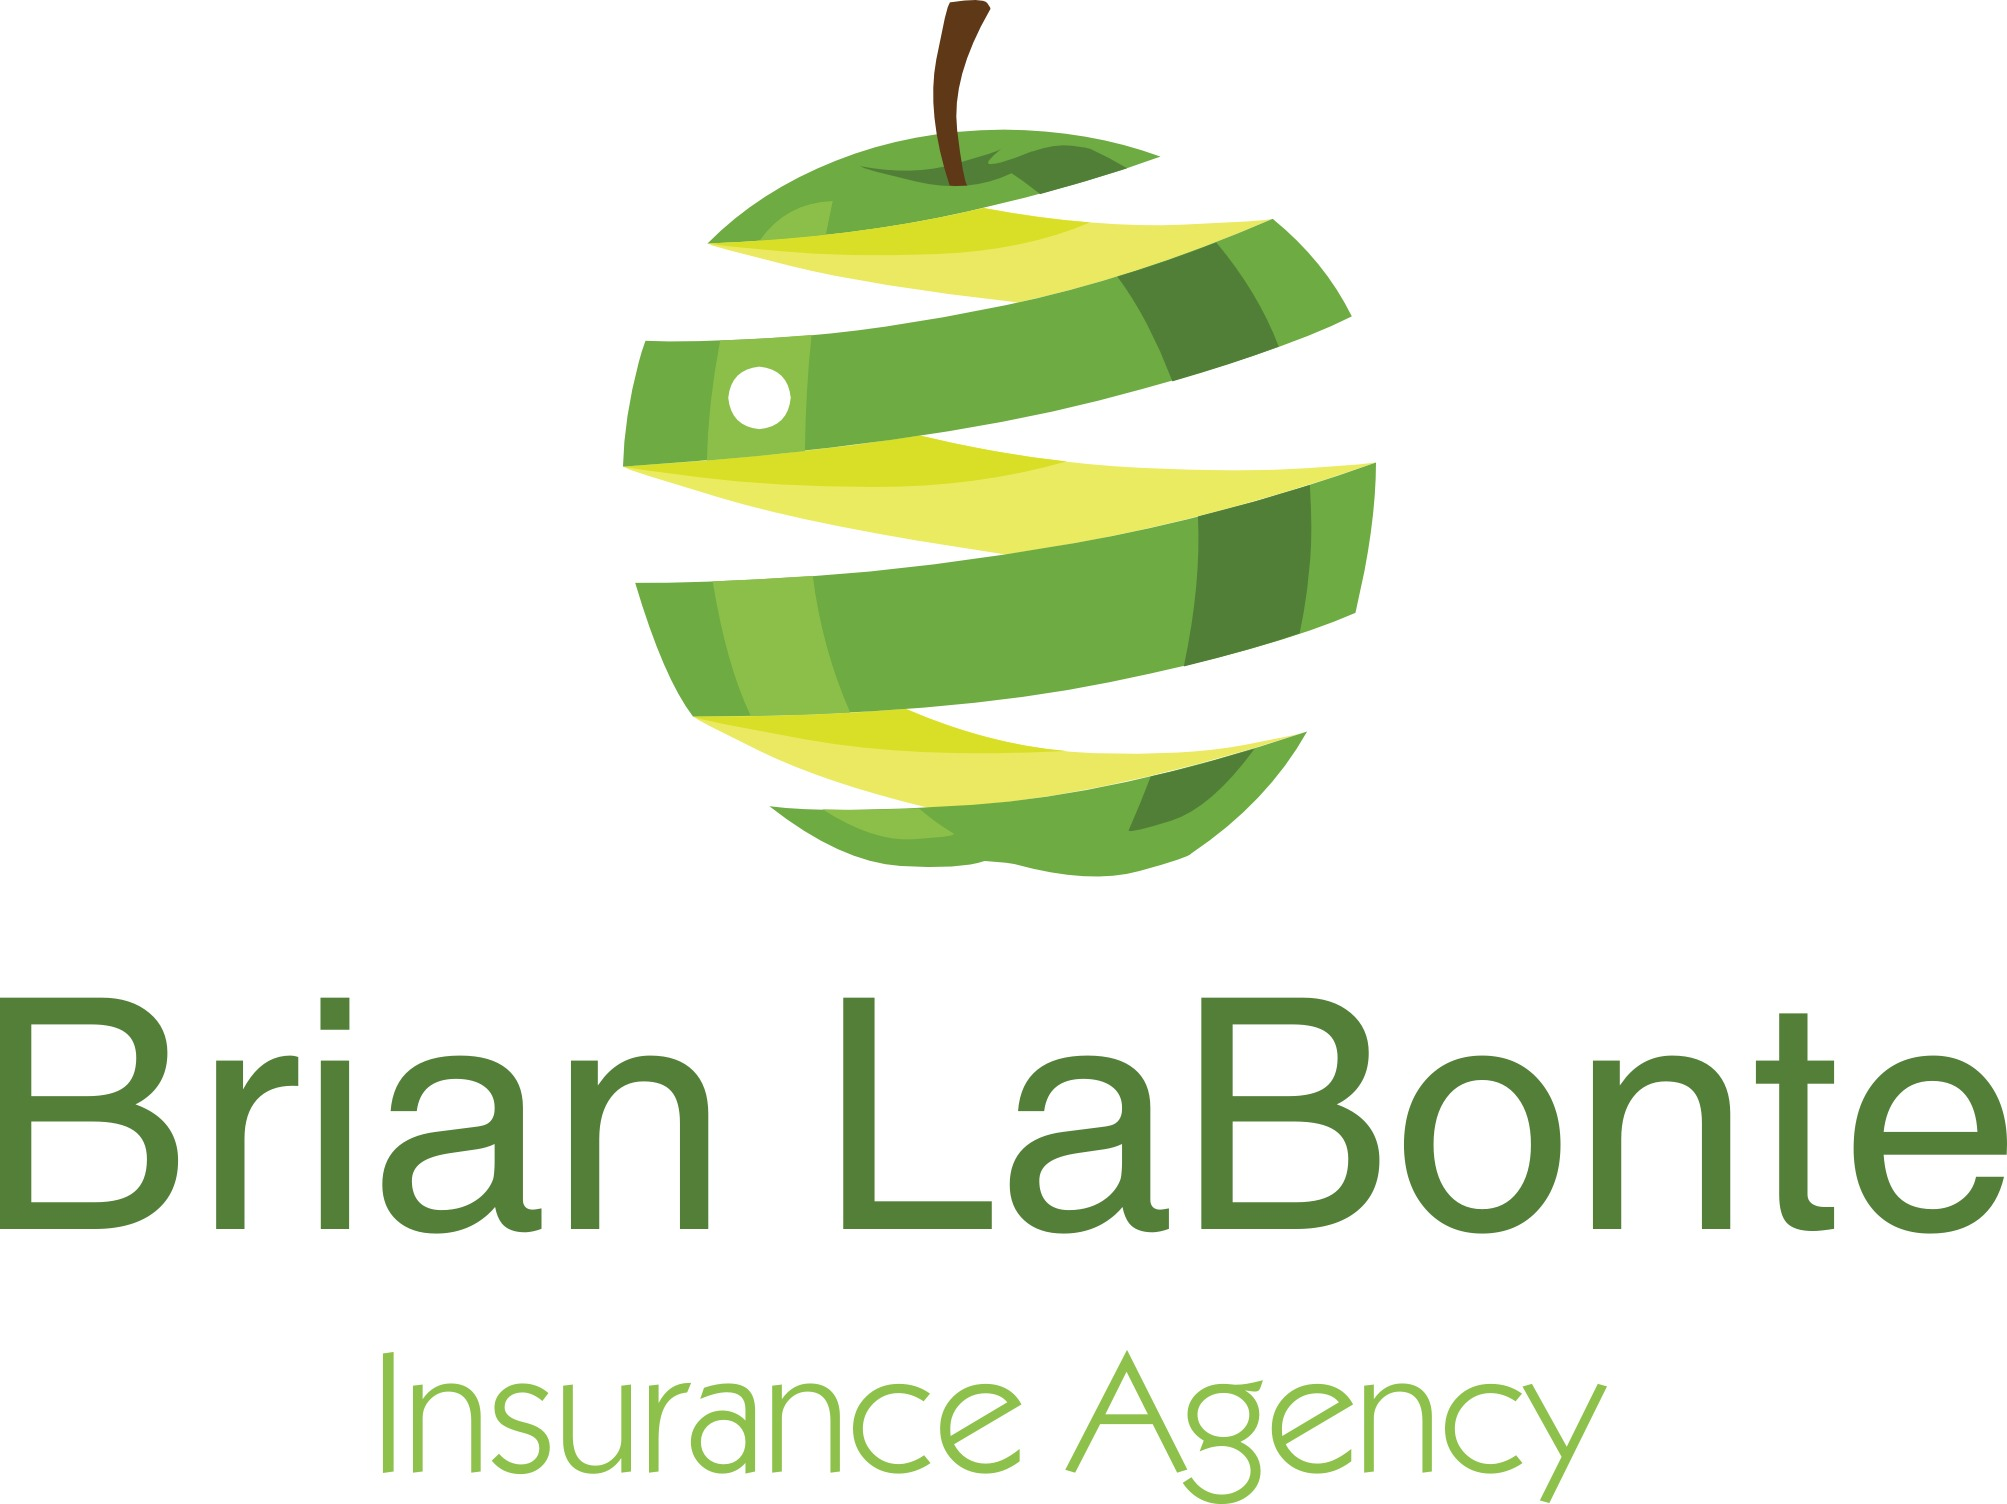 Brian LaBonte Insurance Agency image 0